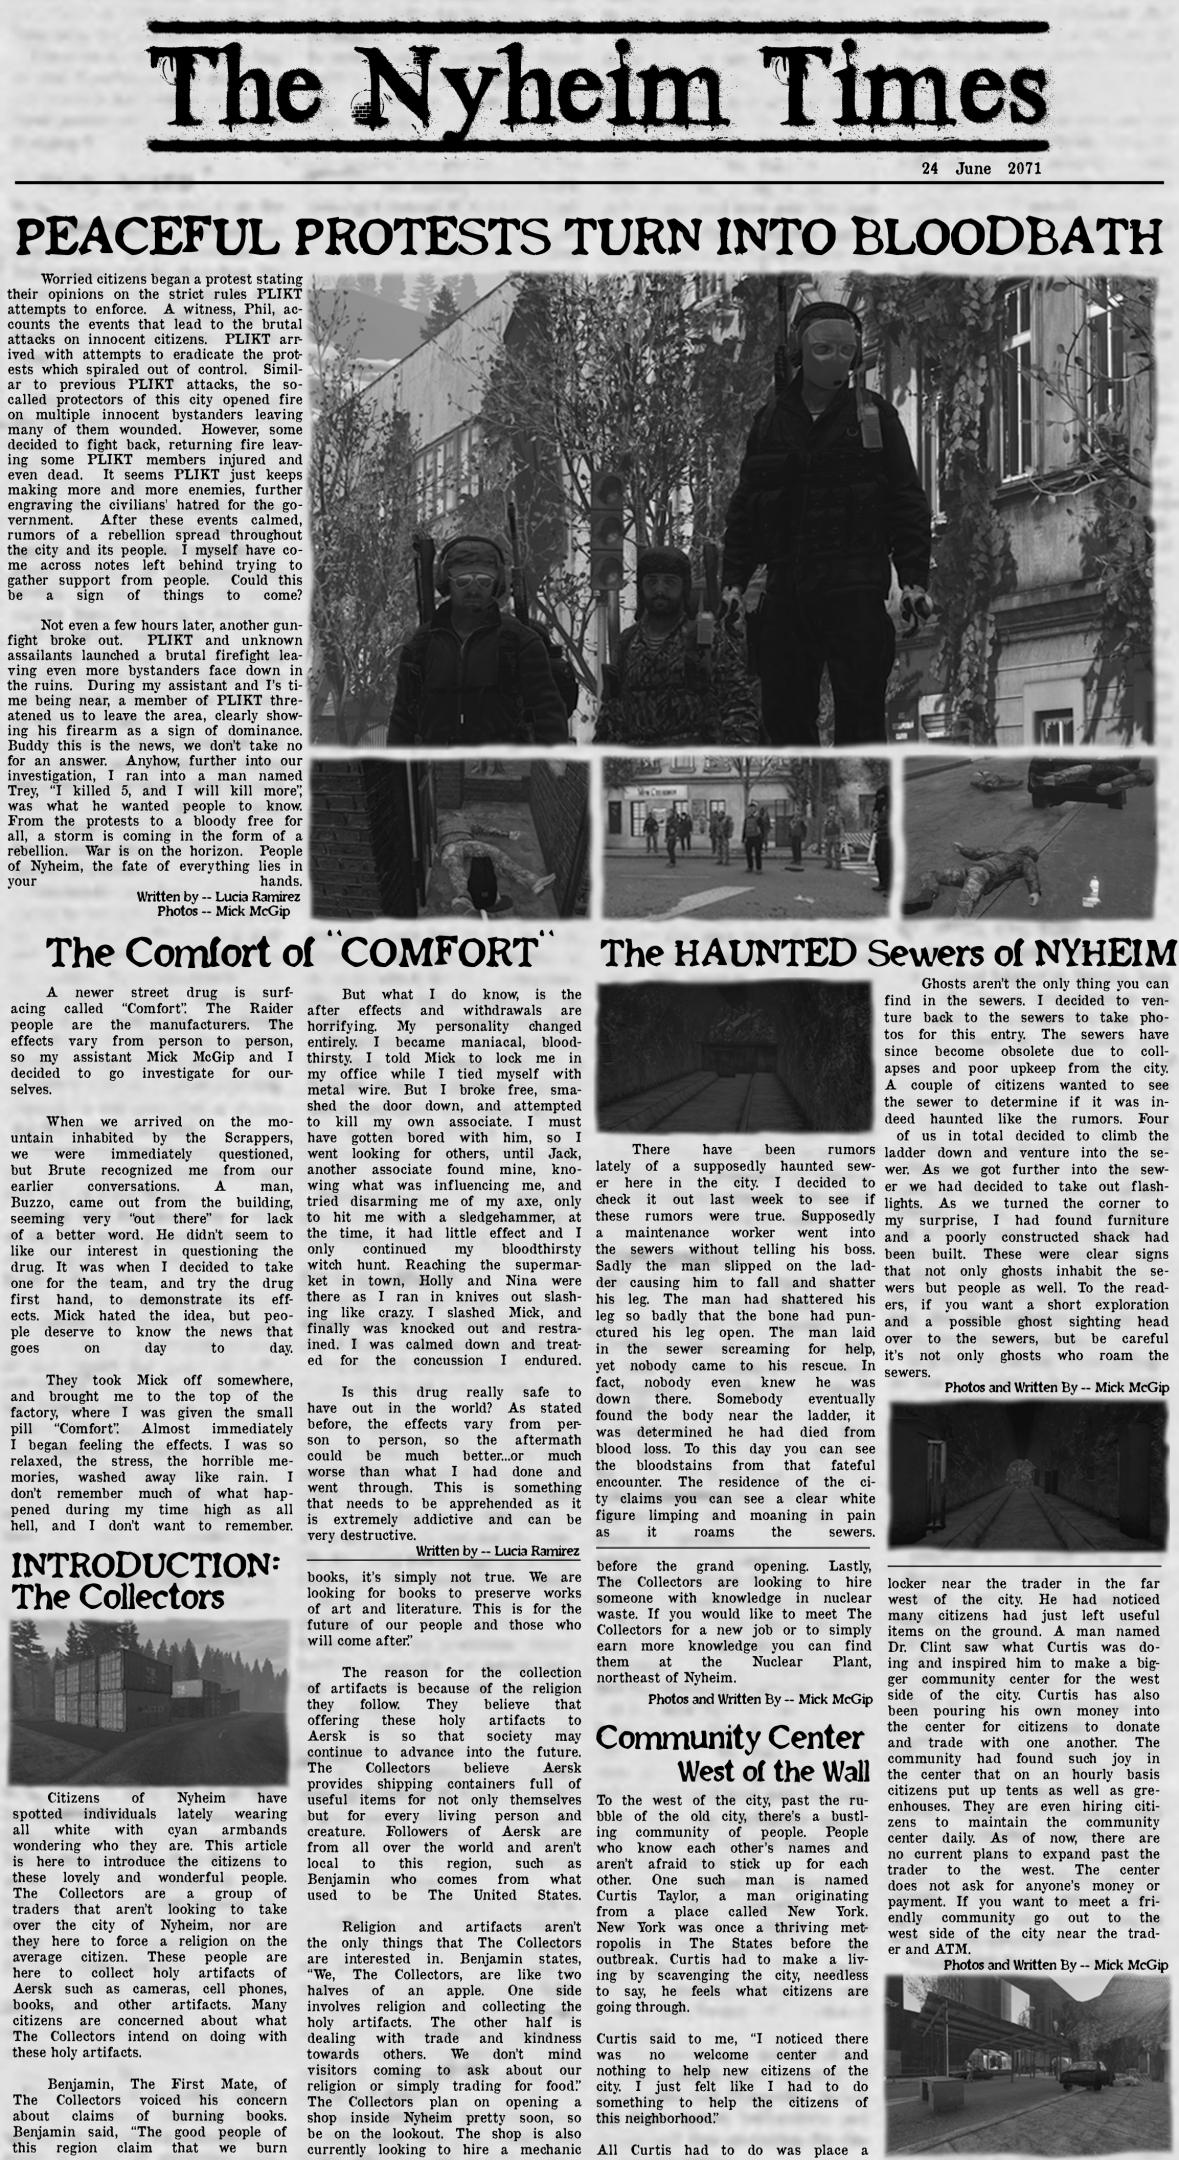 Issue_2.thumb.png.b75ad2fe28af3f5f82f84abf49a8324a.png